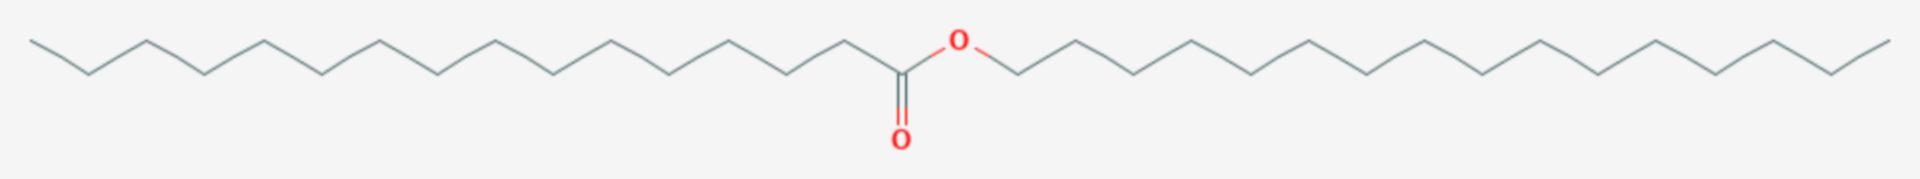 Cetylpalmitat (Strukturformel)